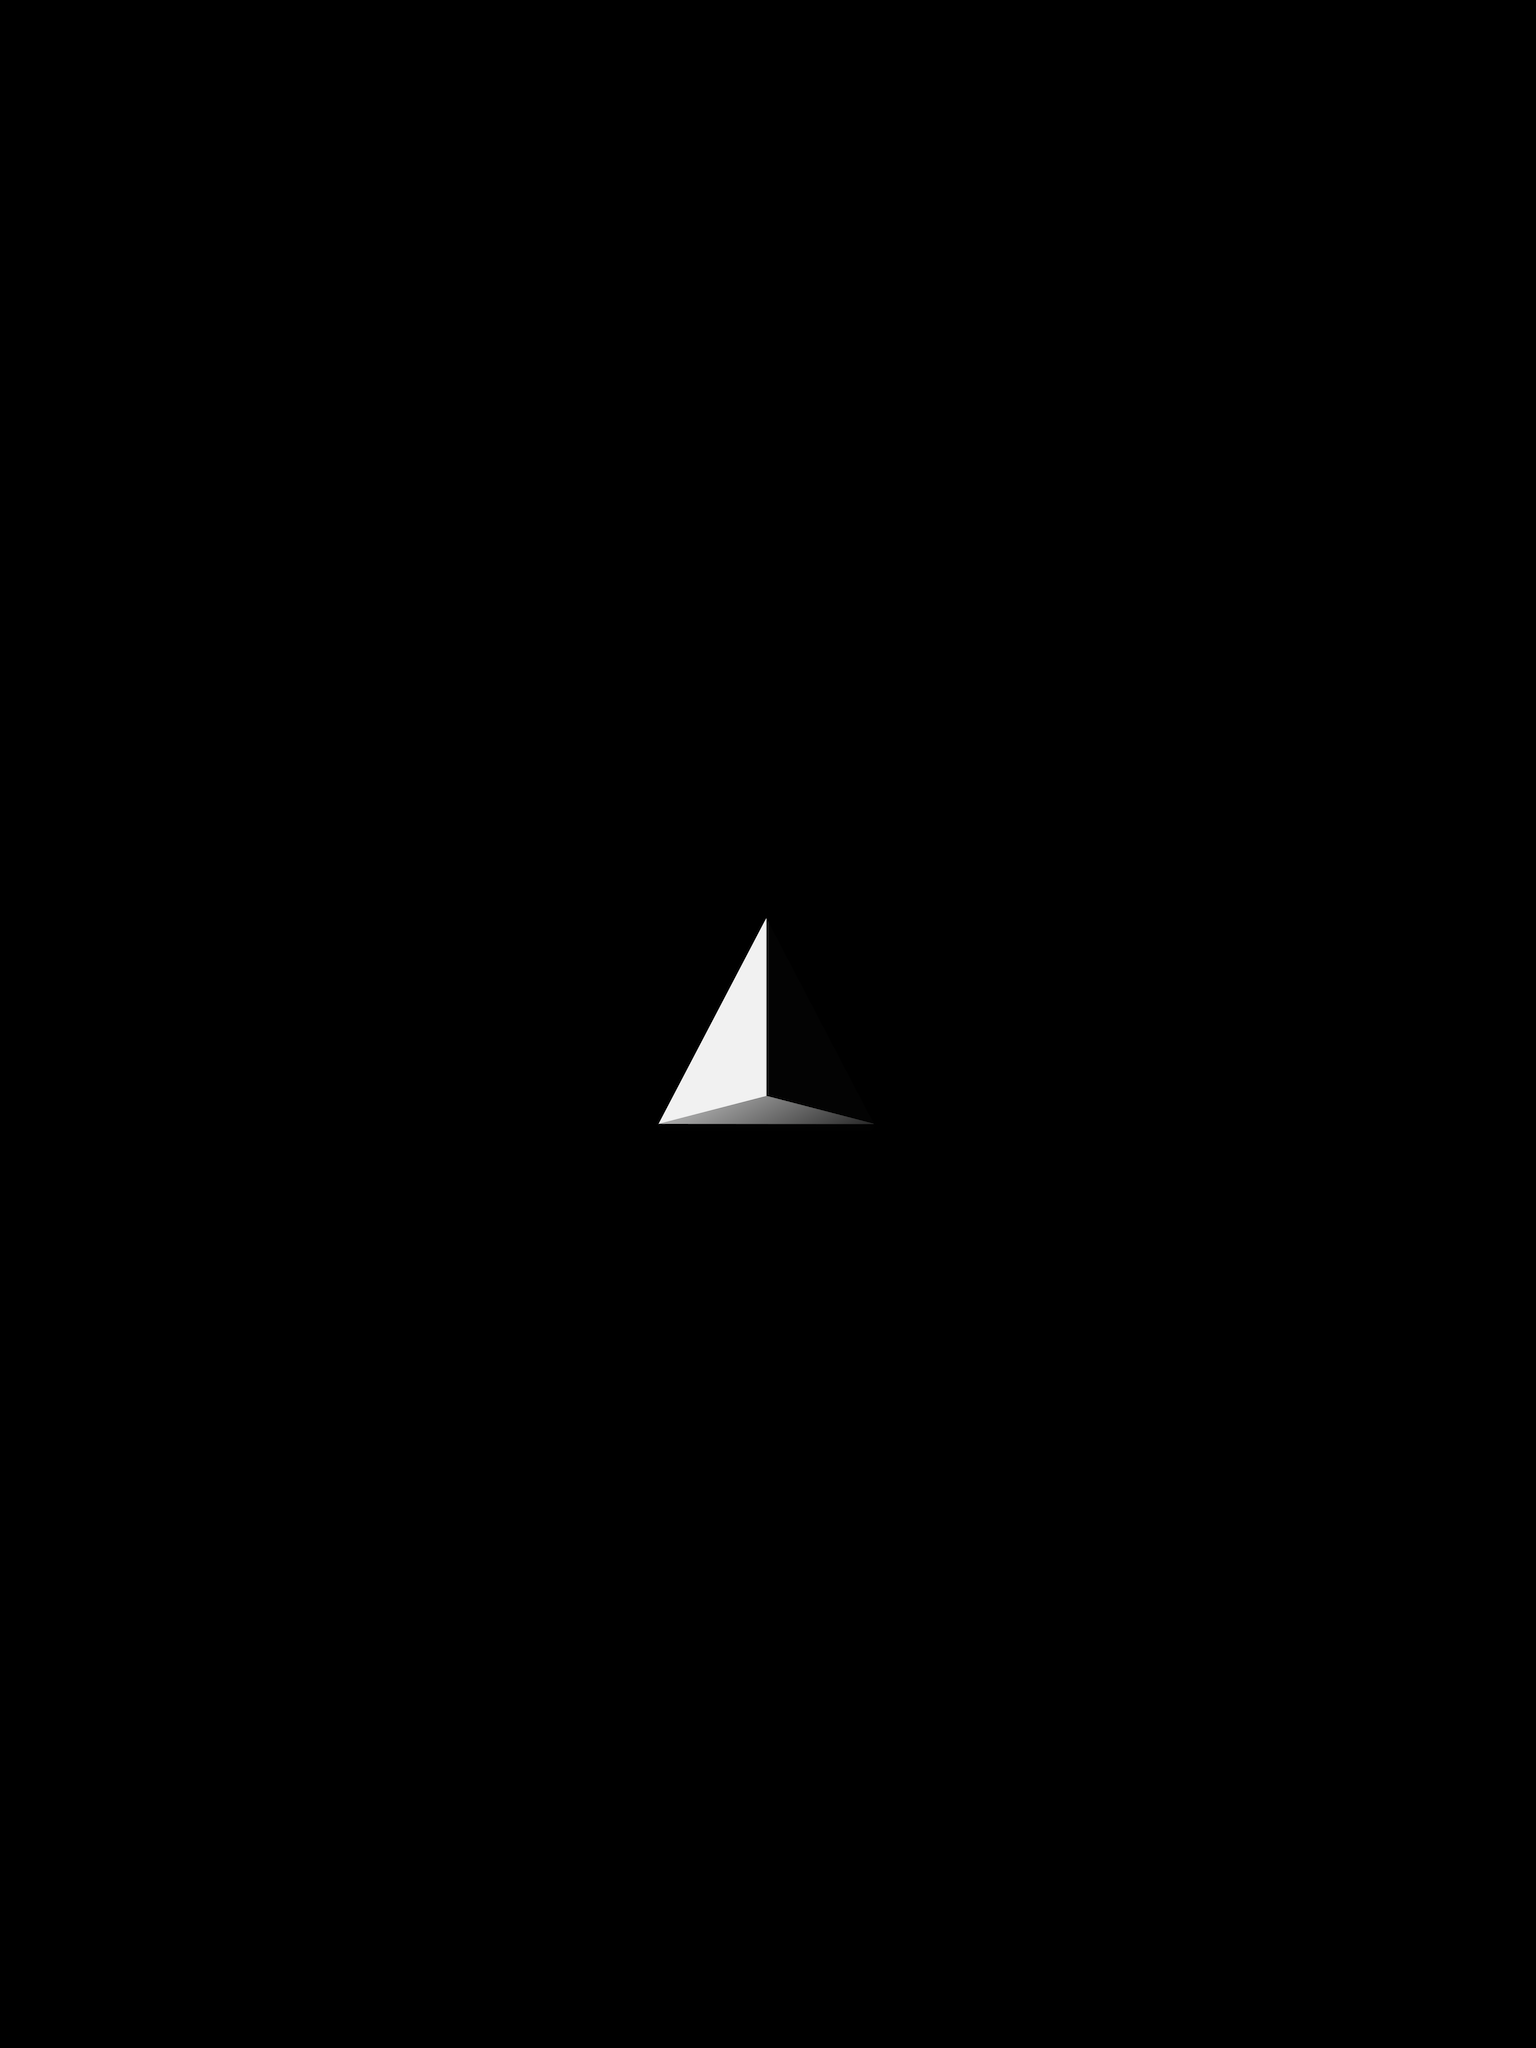 contrib/mobile/iOS/Onelab/Images.xcassets/LaunchImage.launchimage/splash1536x2048.png